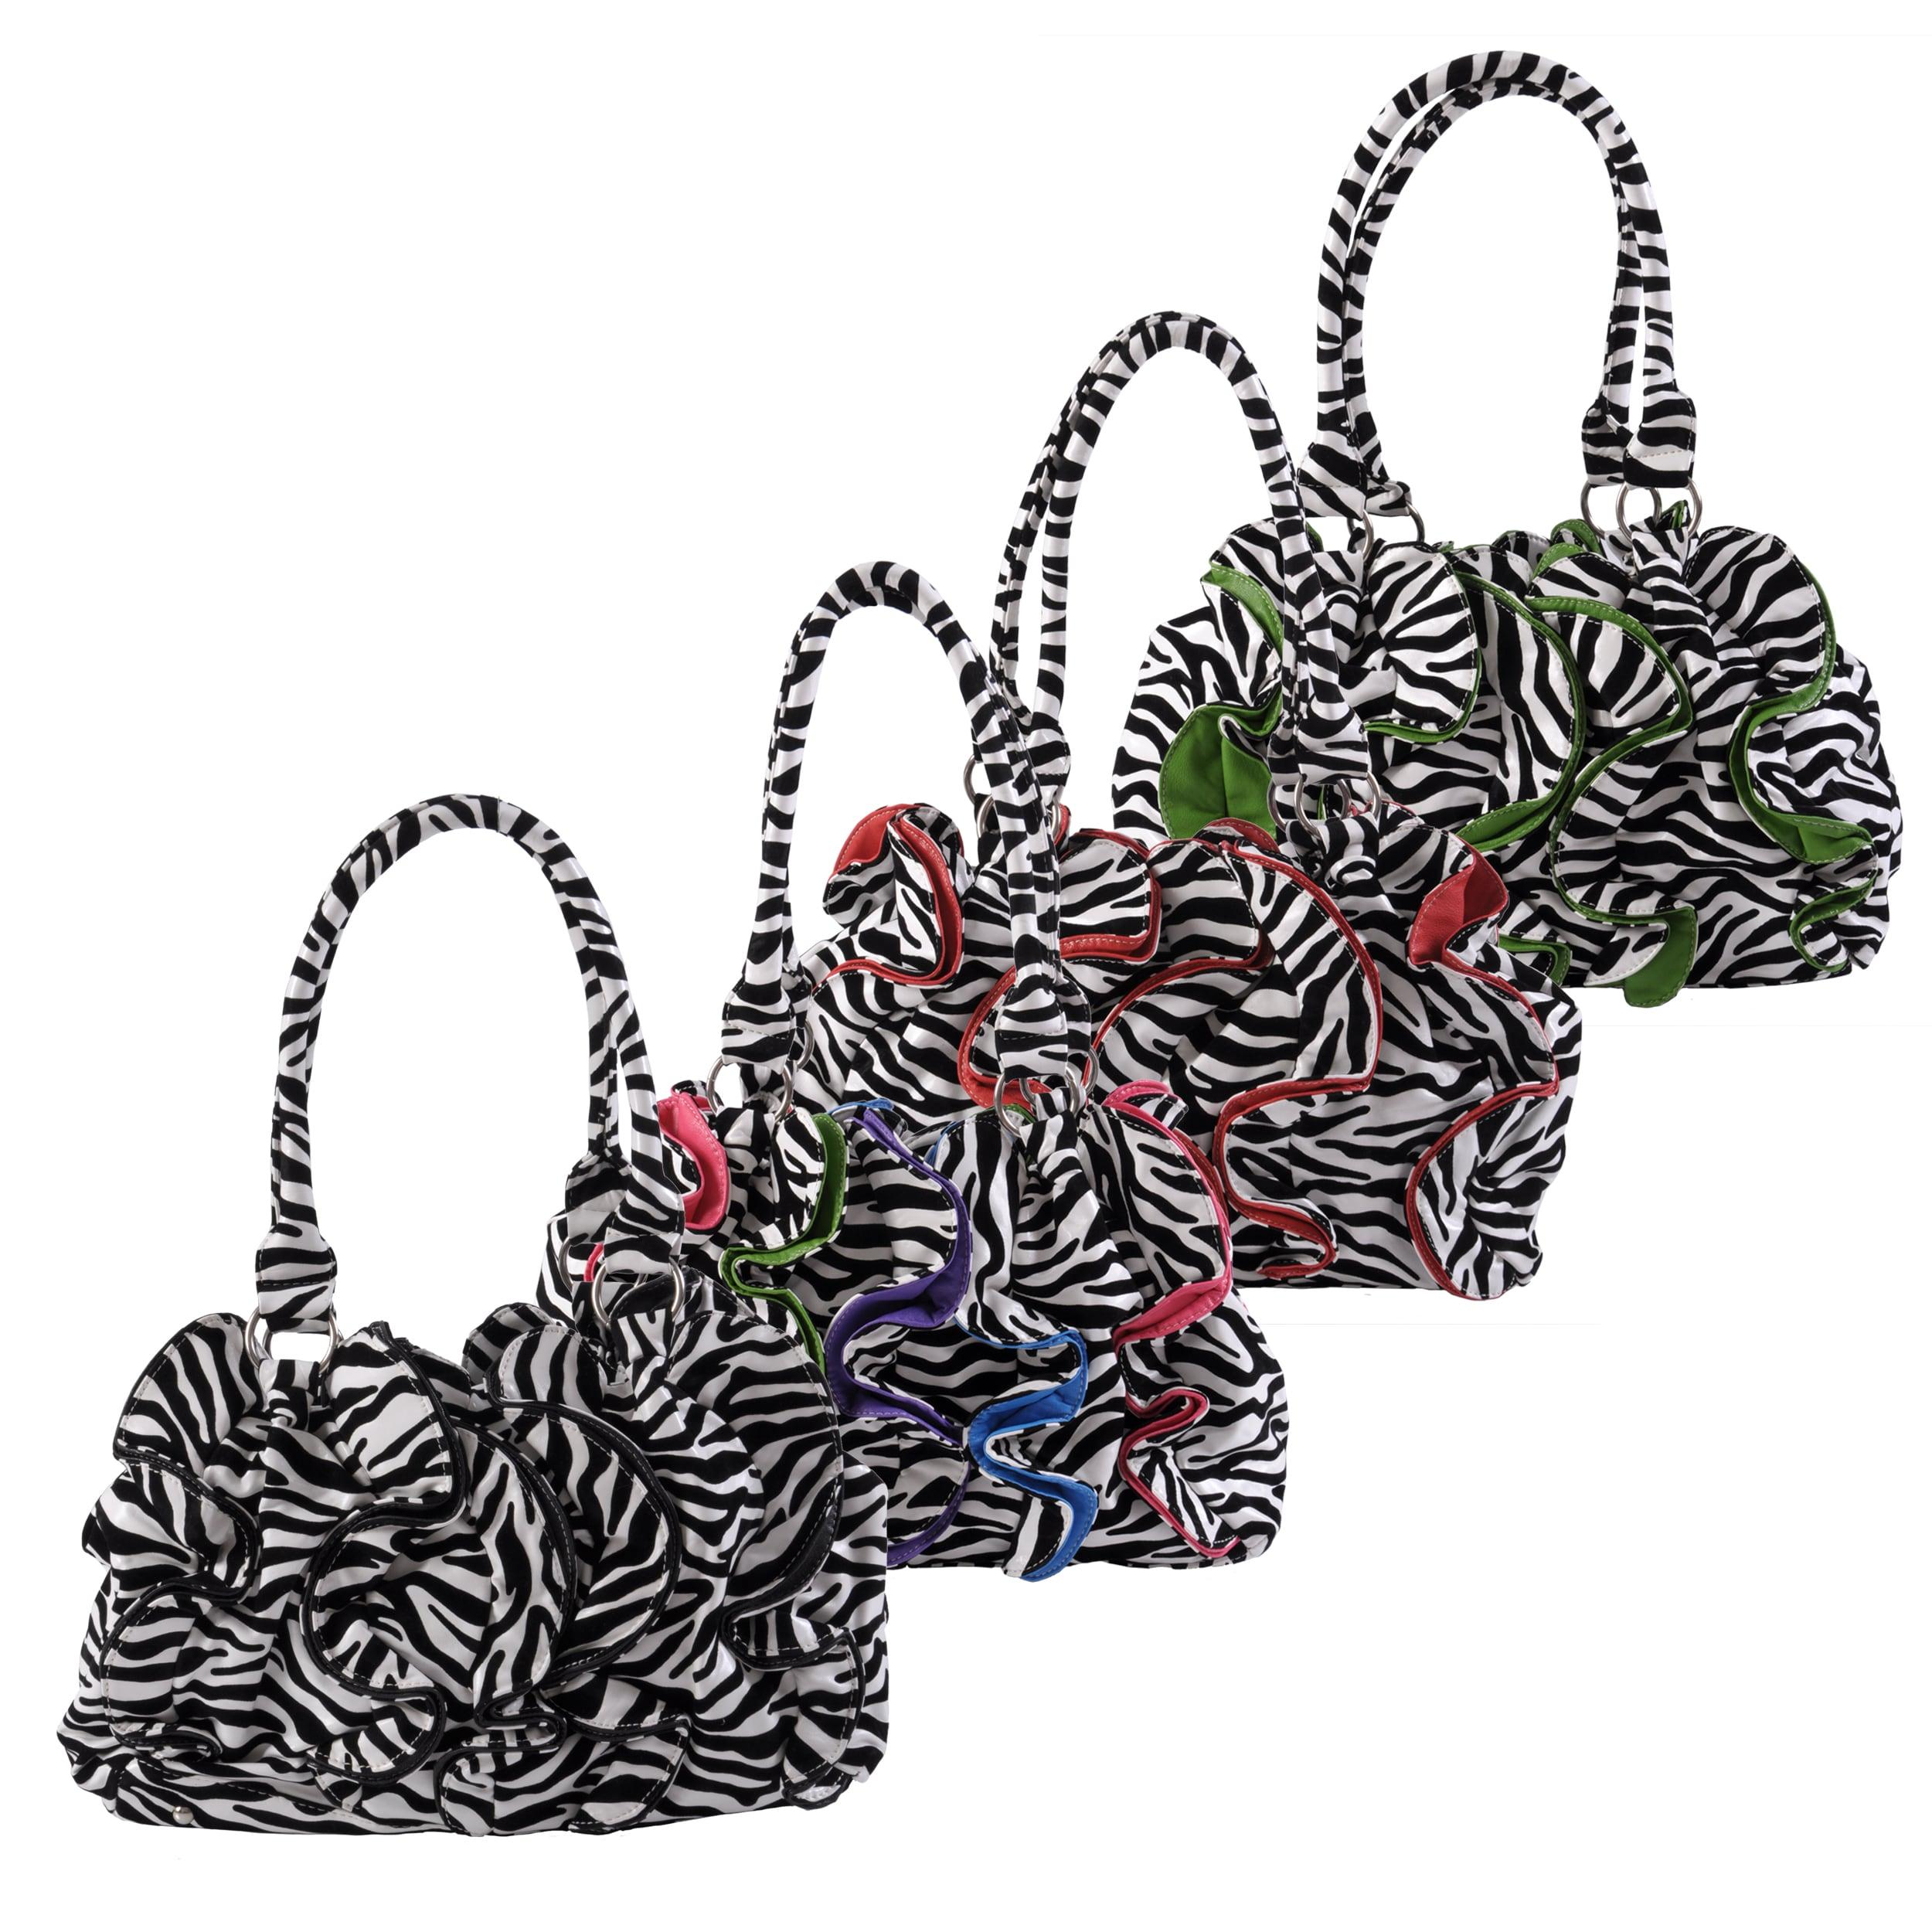 Journee Collection Women's Ruffled Zebra Print Slouchy Satchel